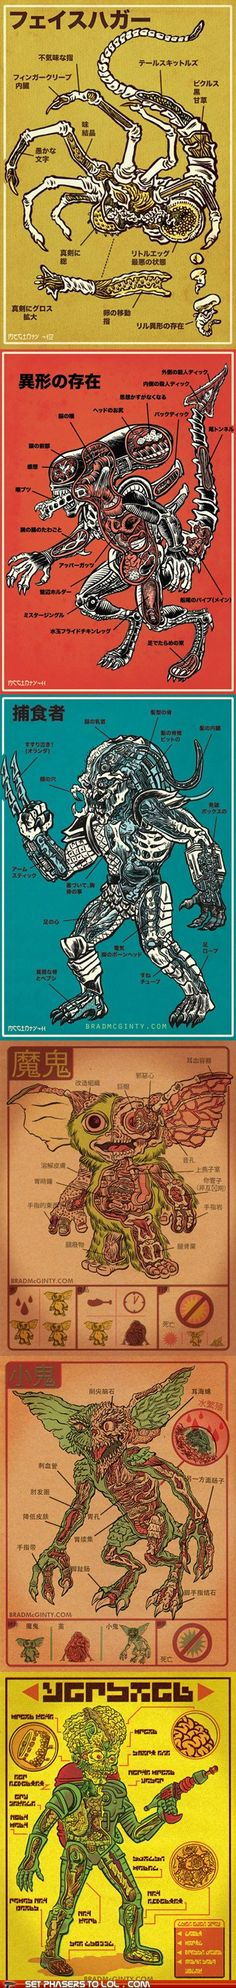 monster anatomy